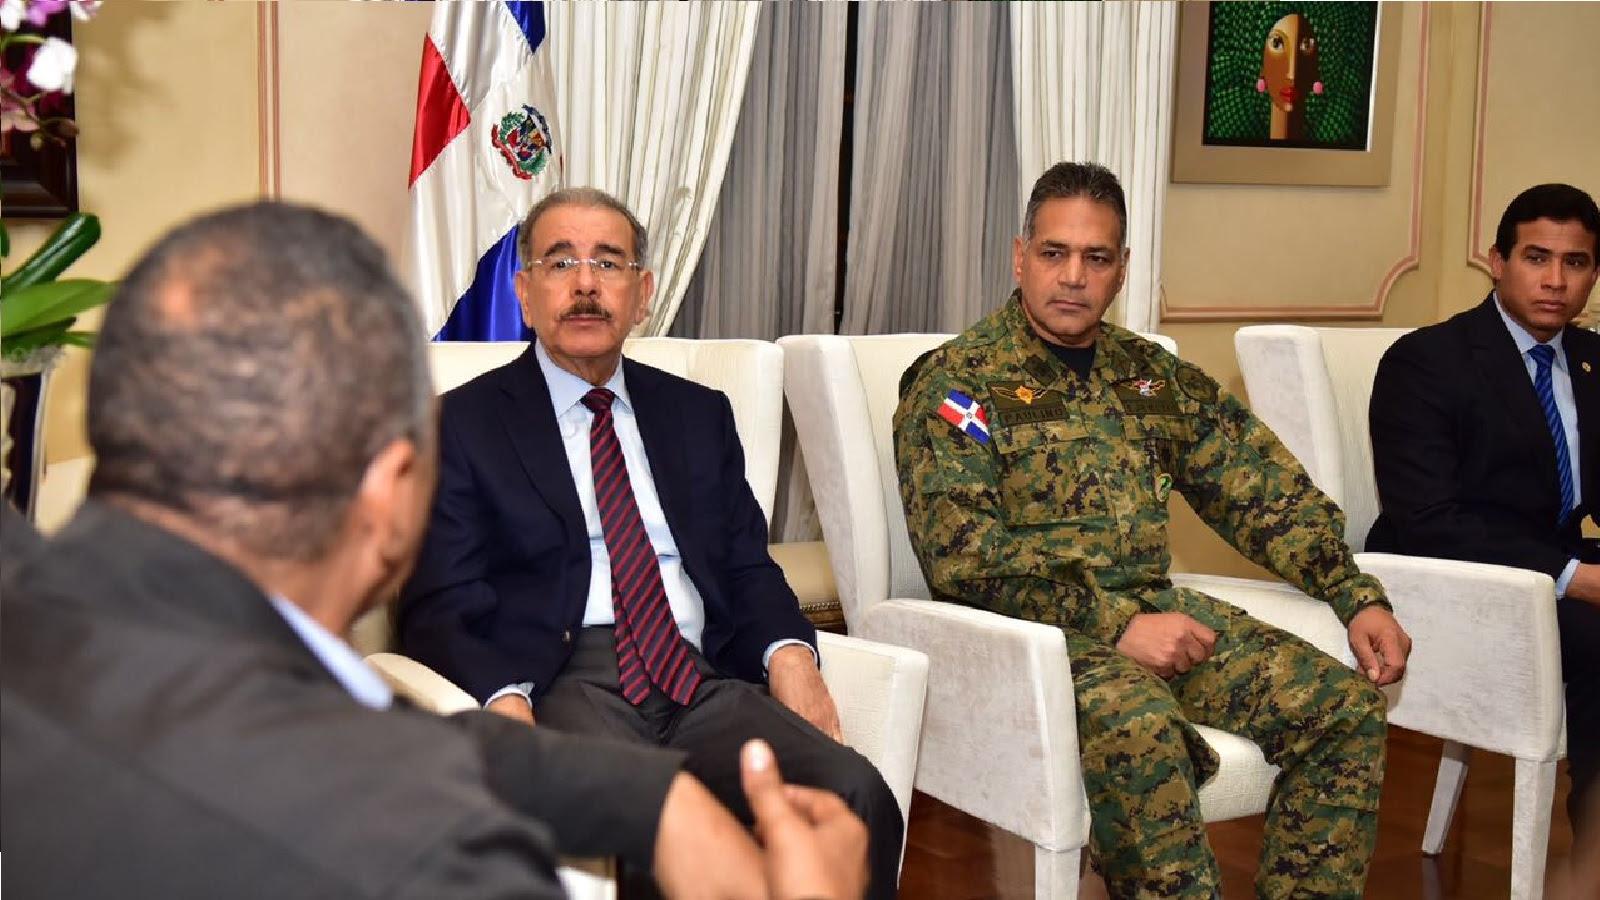 Danilo Medina da seguimiento estricto a el huracán  María. Se reúne con organismos de emergencia